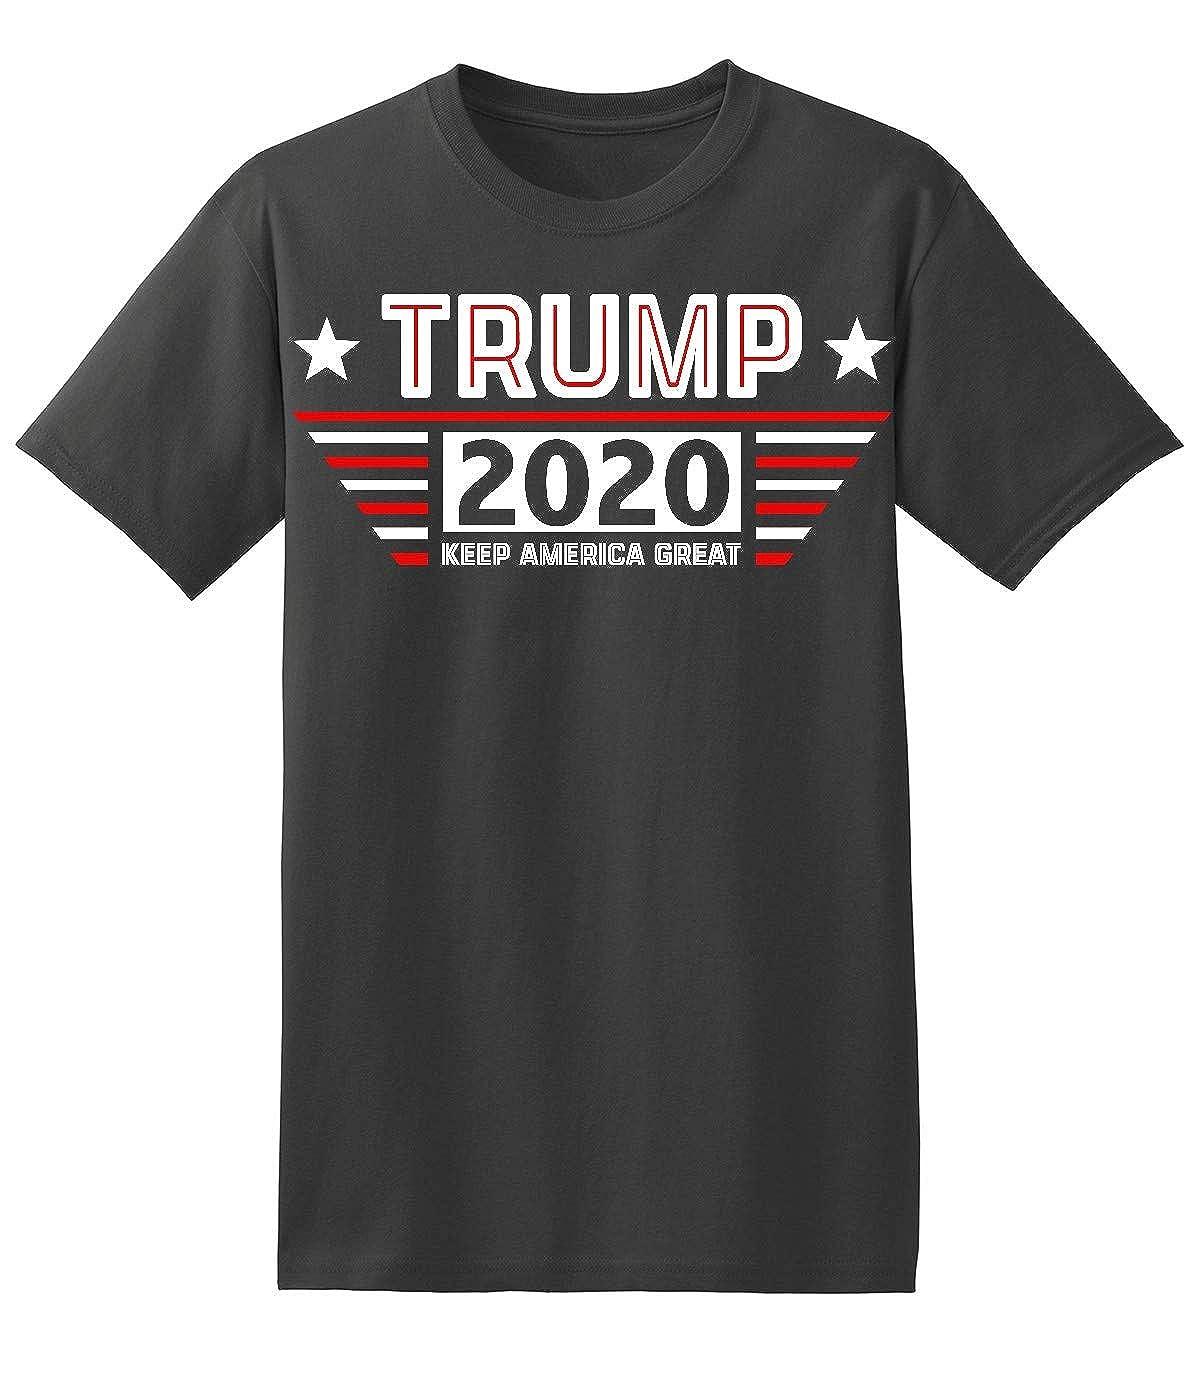 Elephield Trump 2020 Keep America Great Retro Style Men S Shirts